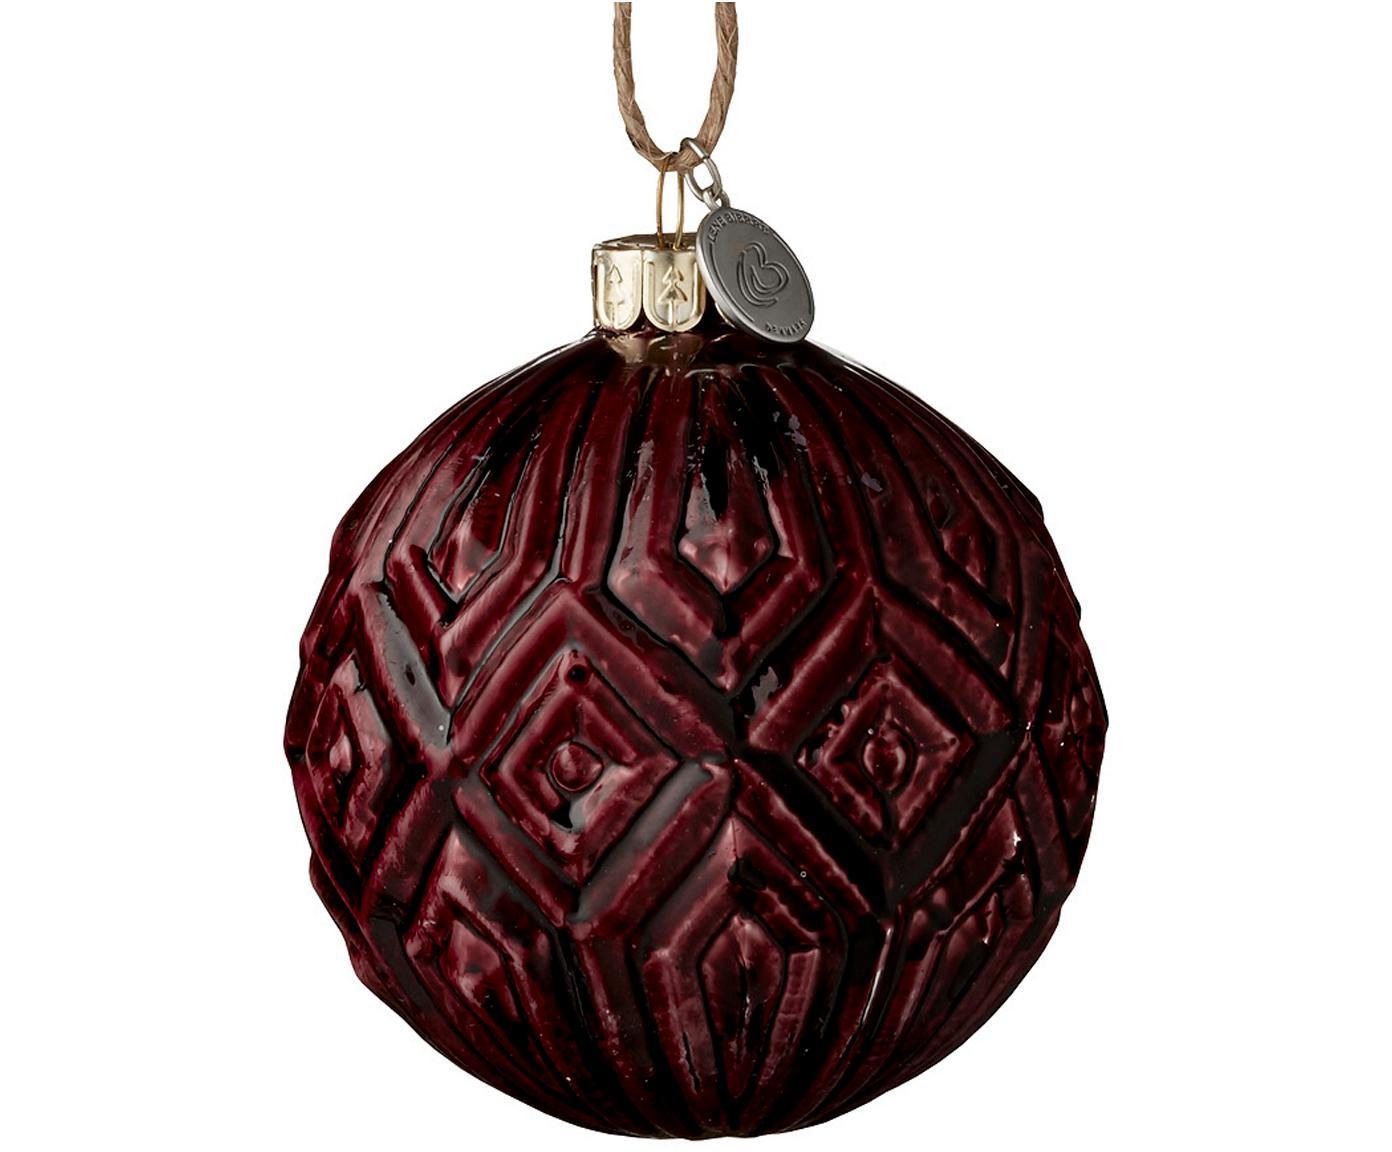 Kerstballen Cemianne, 2 stuks, Donkerrood, Ø 8 x H 8 cm